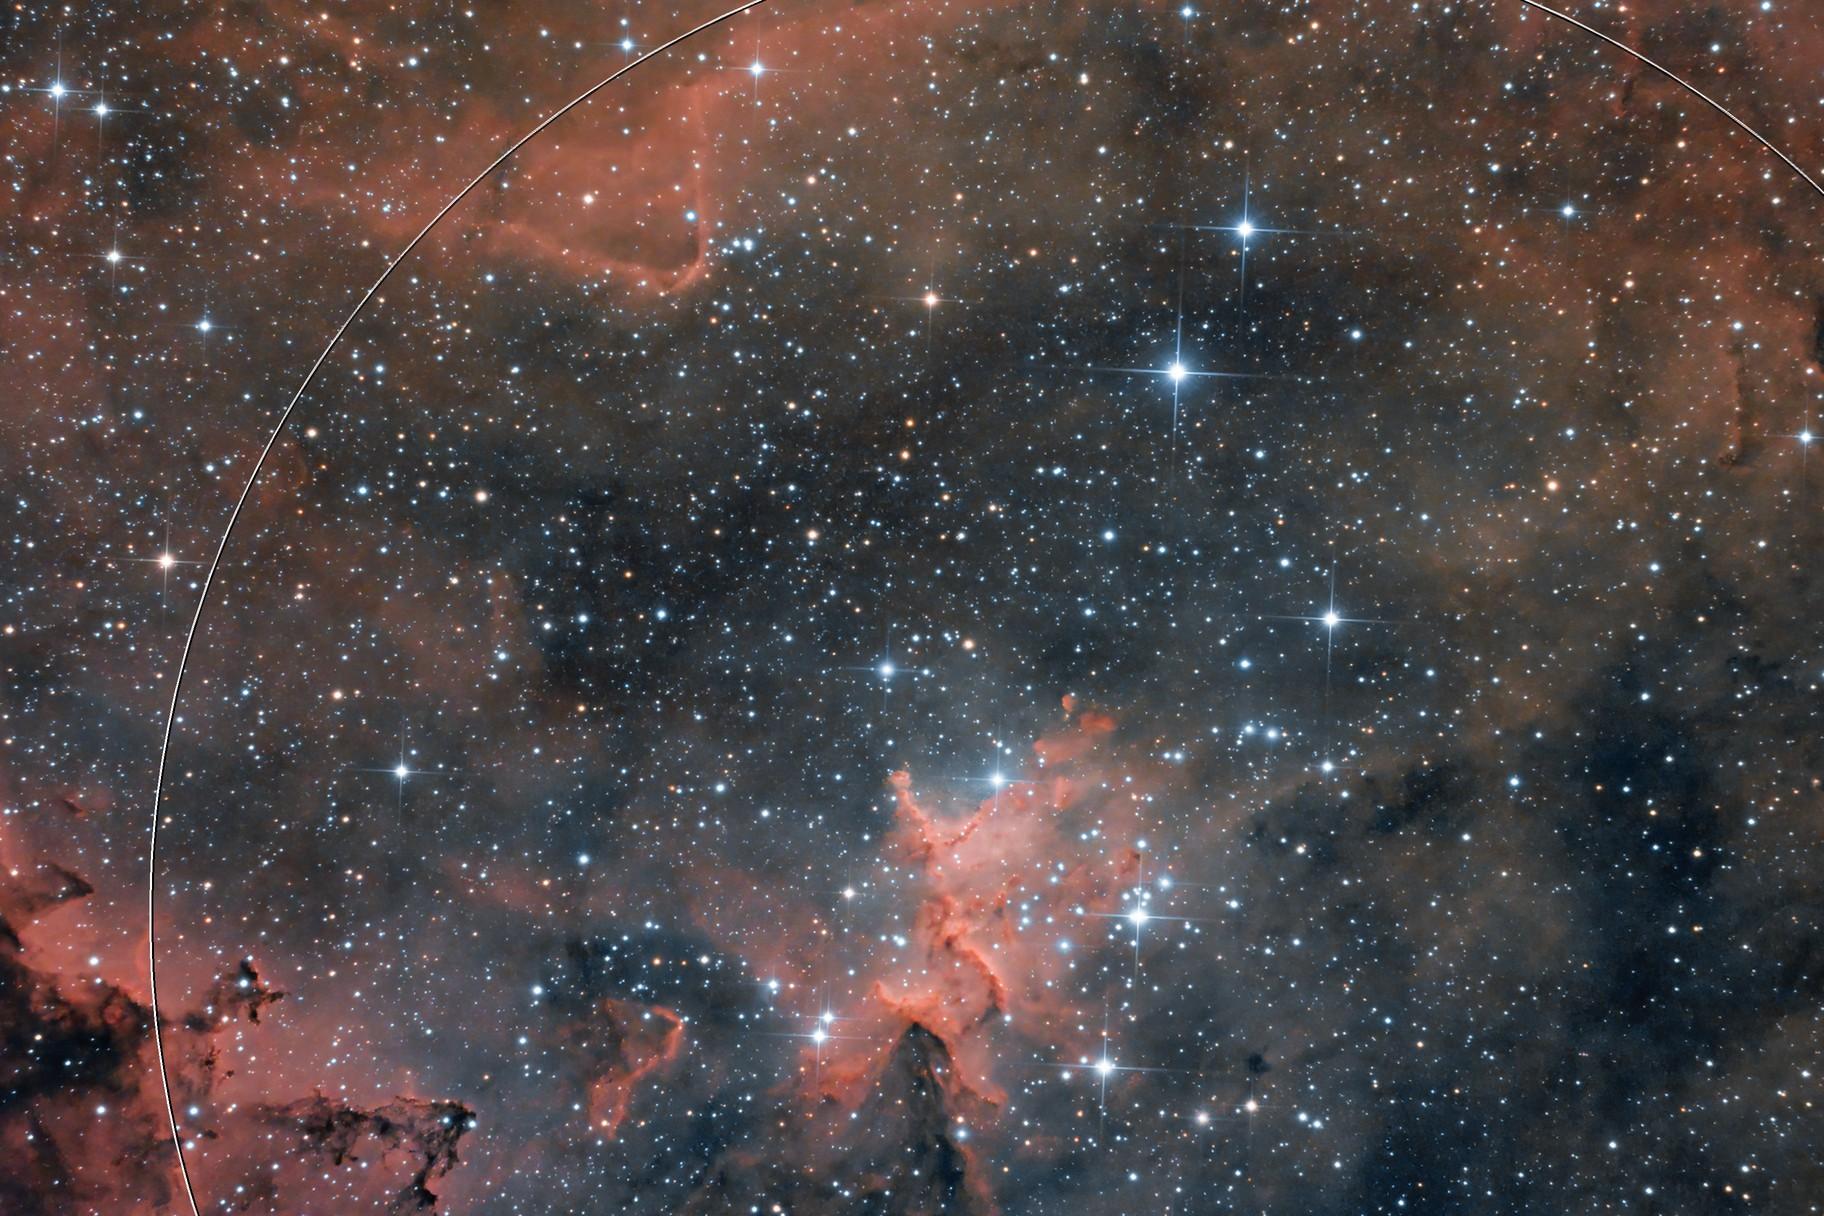 The center of Heart Nebula